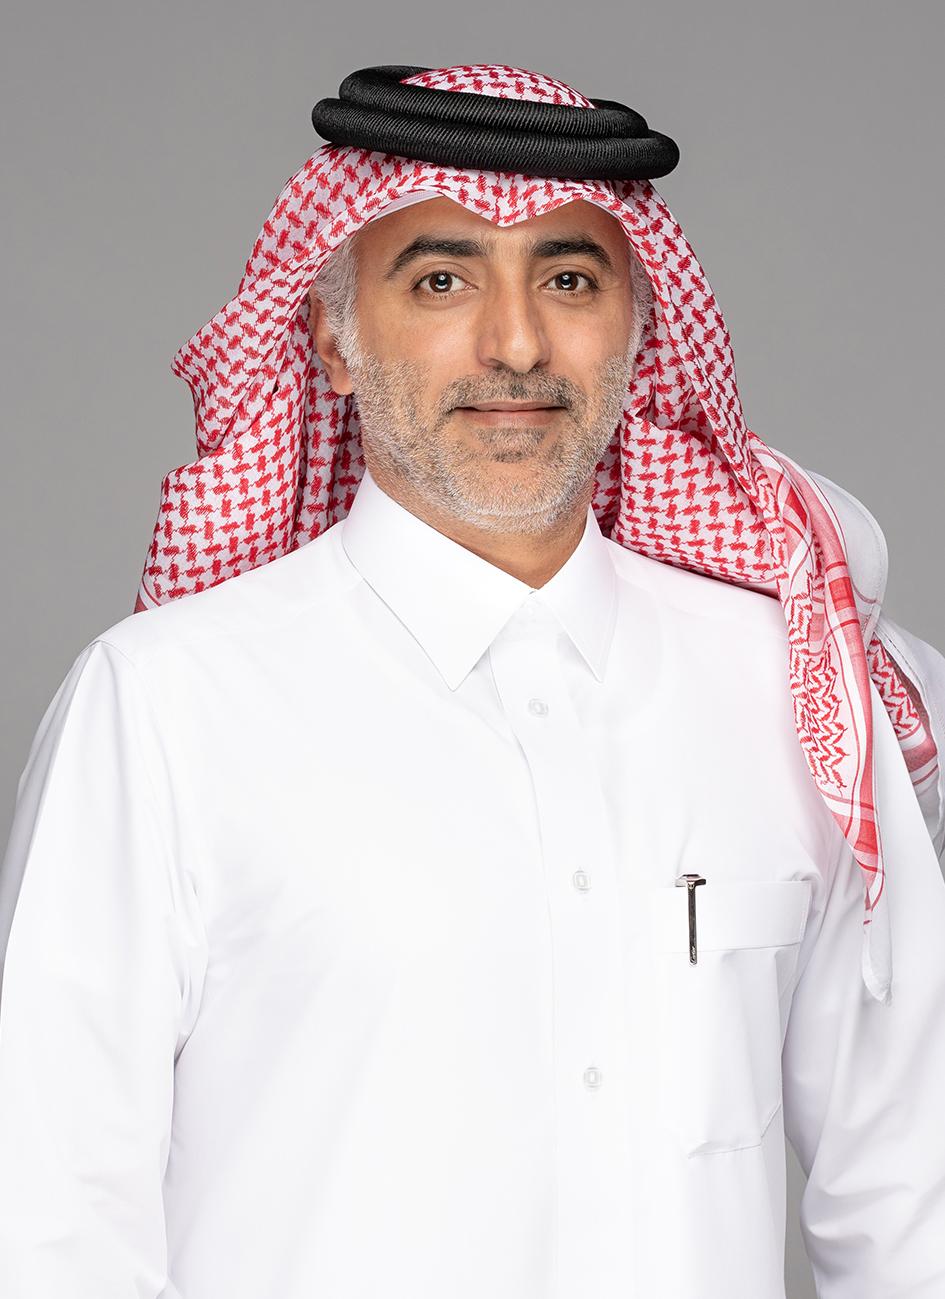 Abdulhadi Fahad Al Hajri